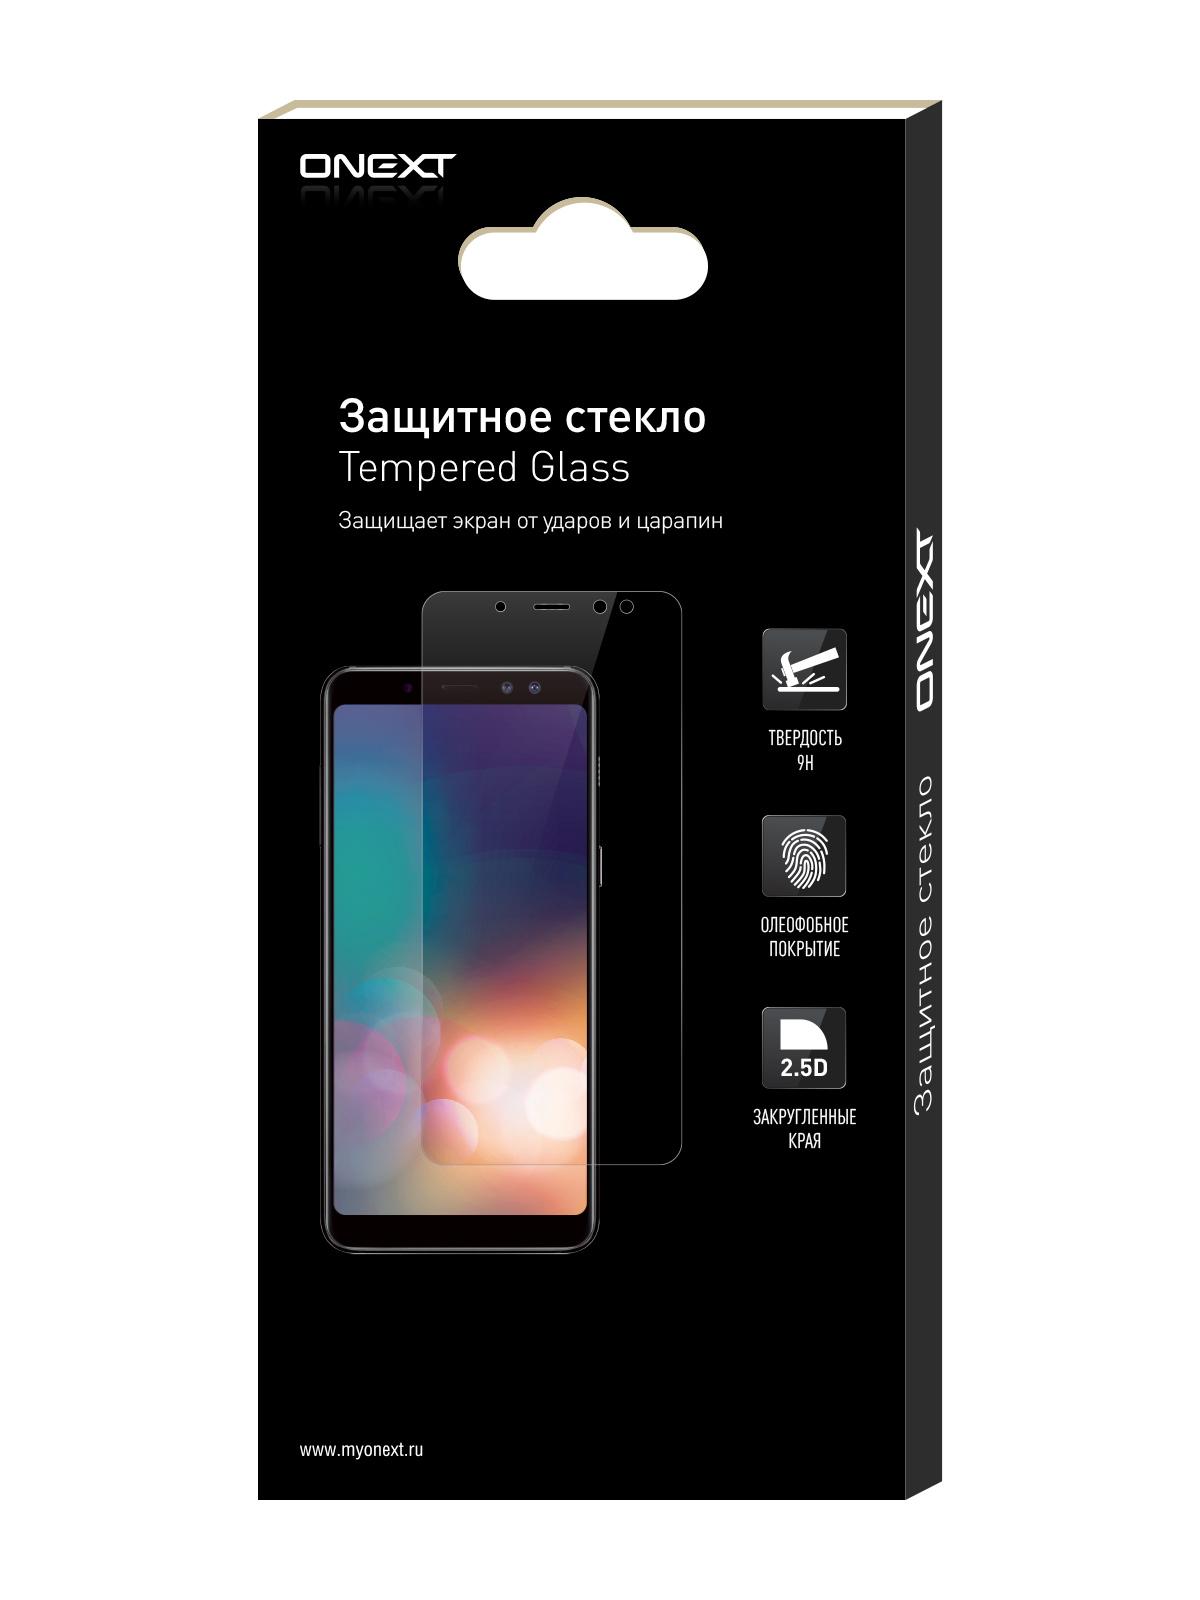 Защитное стекло ONEXT HTC Desire 828 защитное стекло для htc desire 628 onext